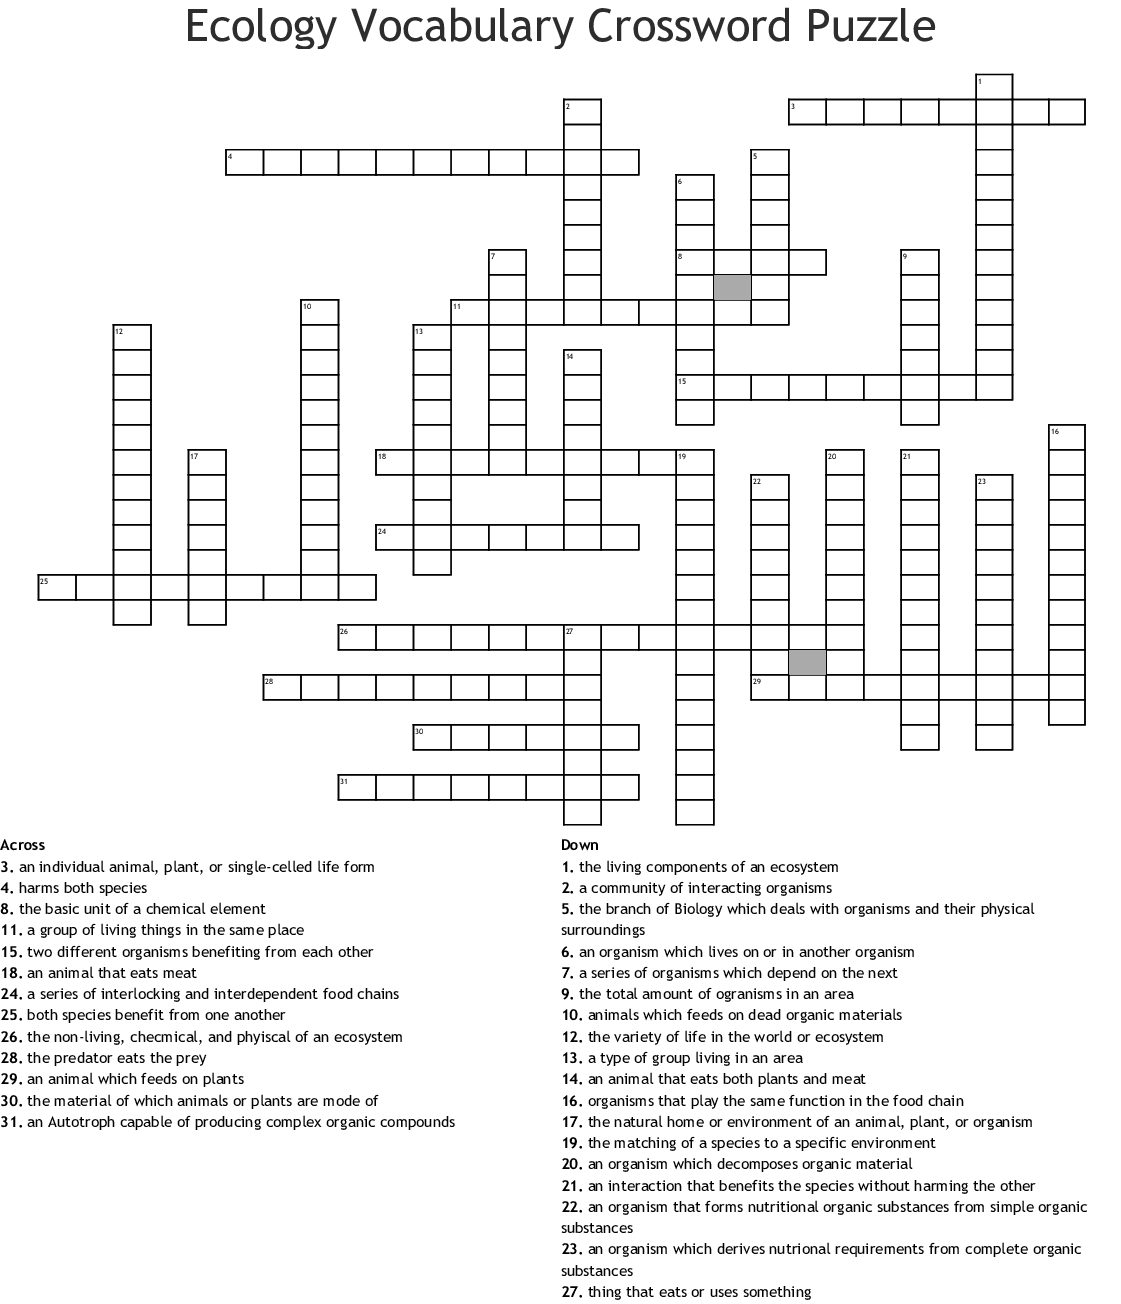 Ecology Vocabulary Crossword Puzzle